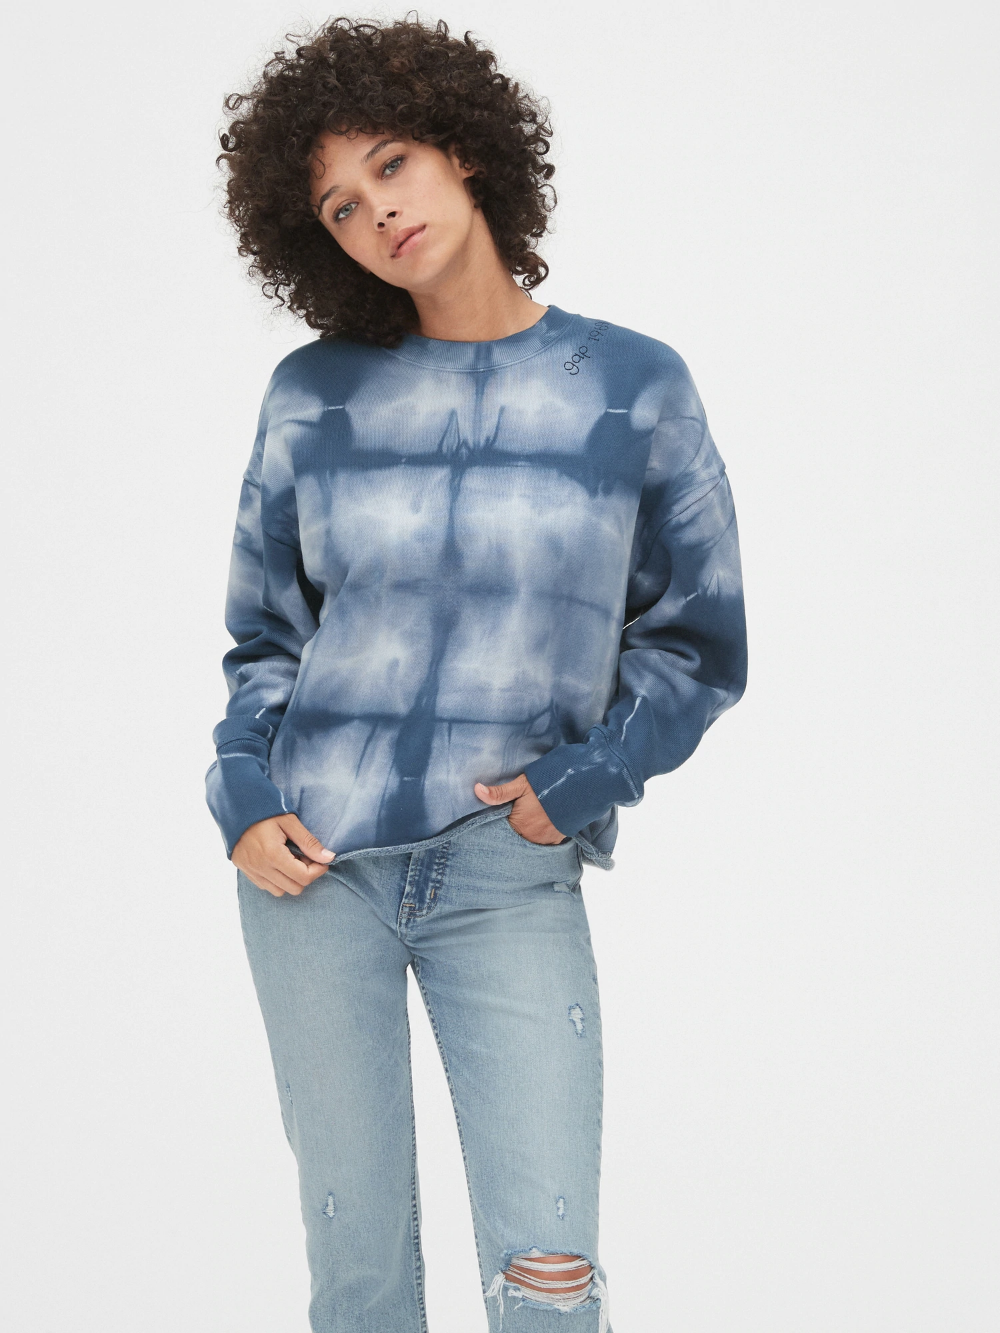 Gap 50th Anniversary Embroidered Crop Crewneck Sweatshirt Gap Women Clothes Sale Women Sweatshirts Women [ 1333 x 1000 Pixel ]